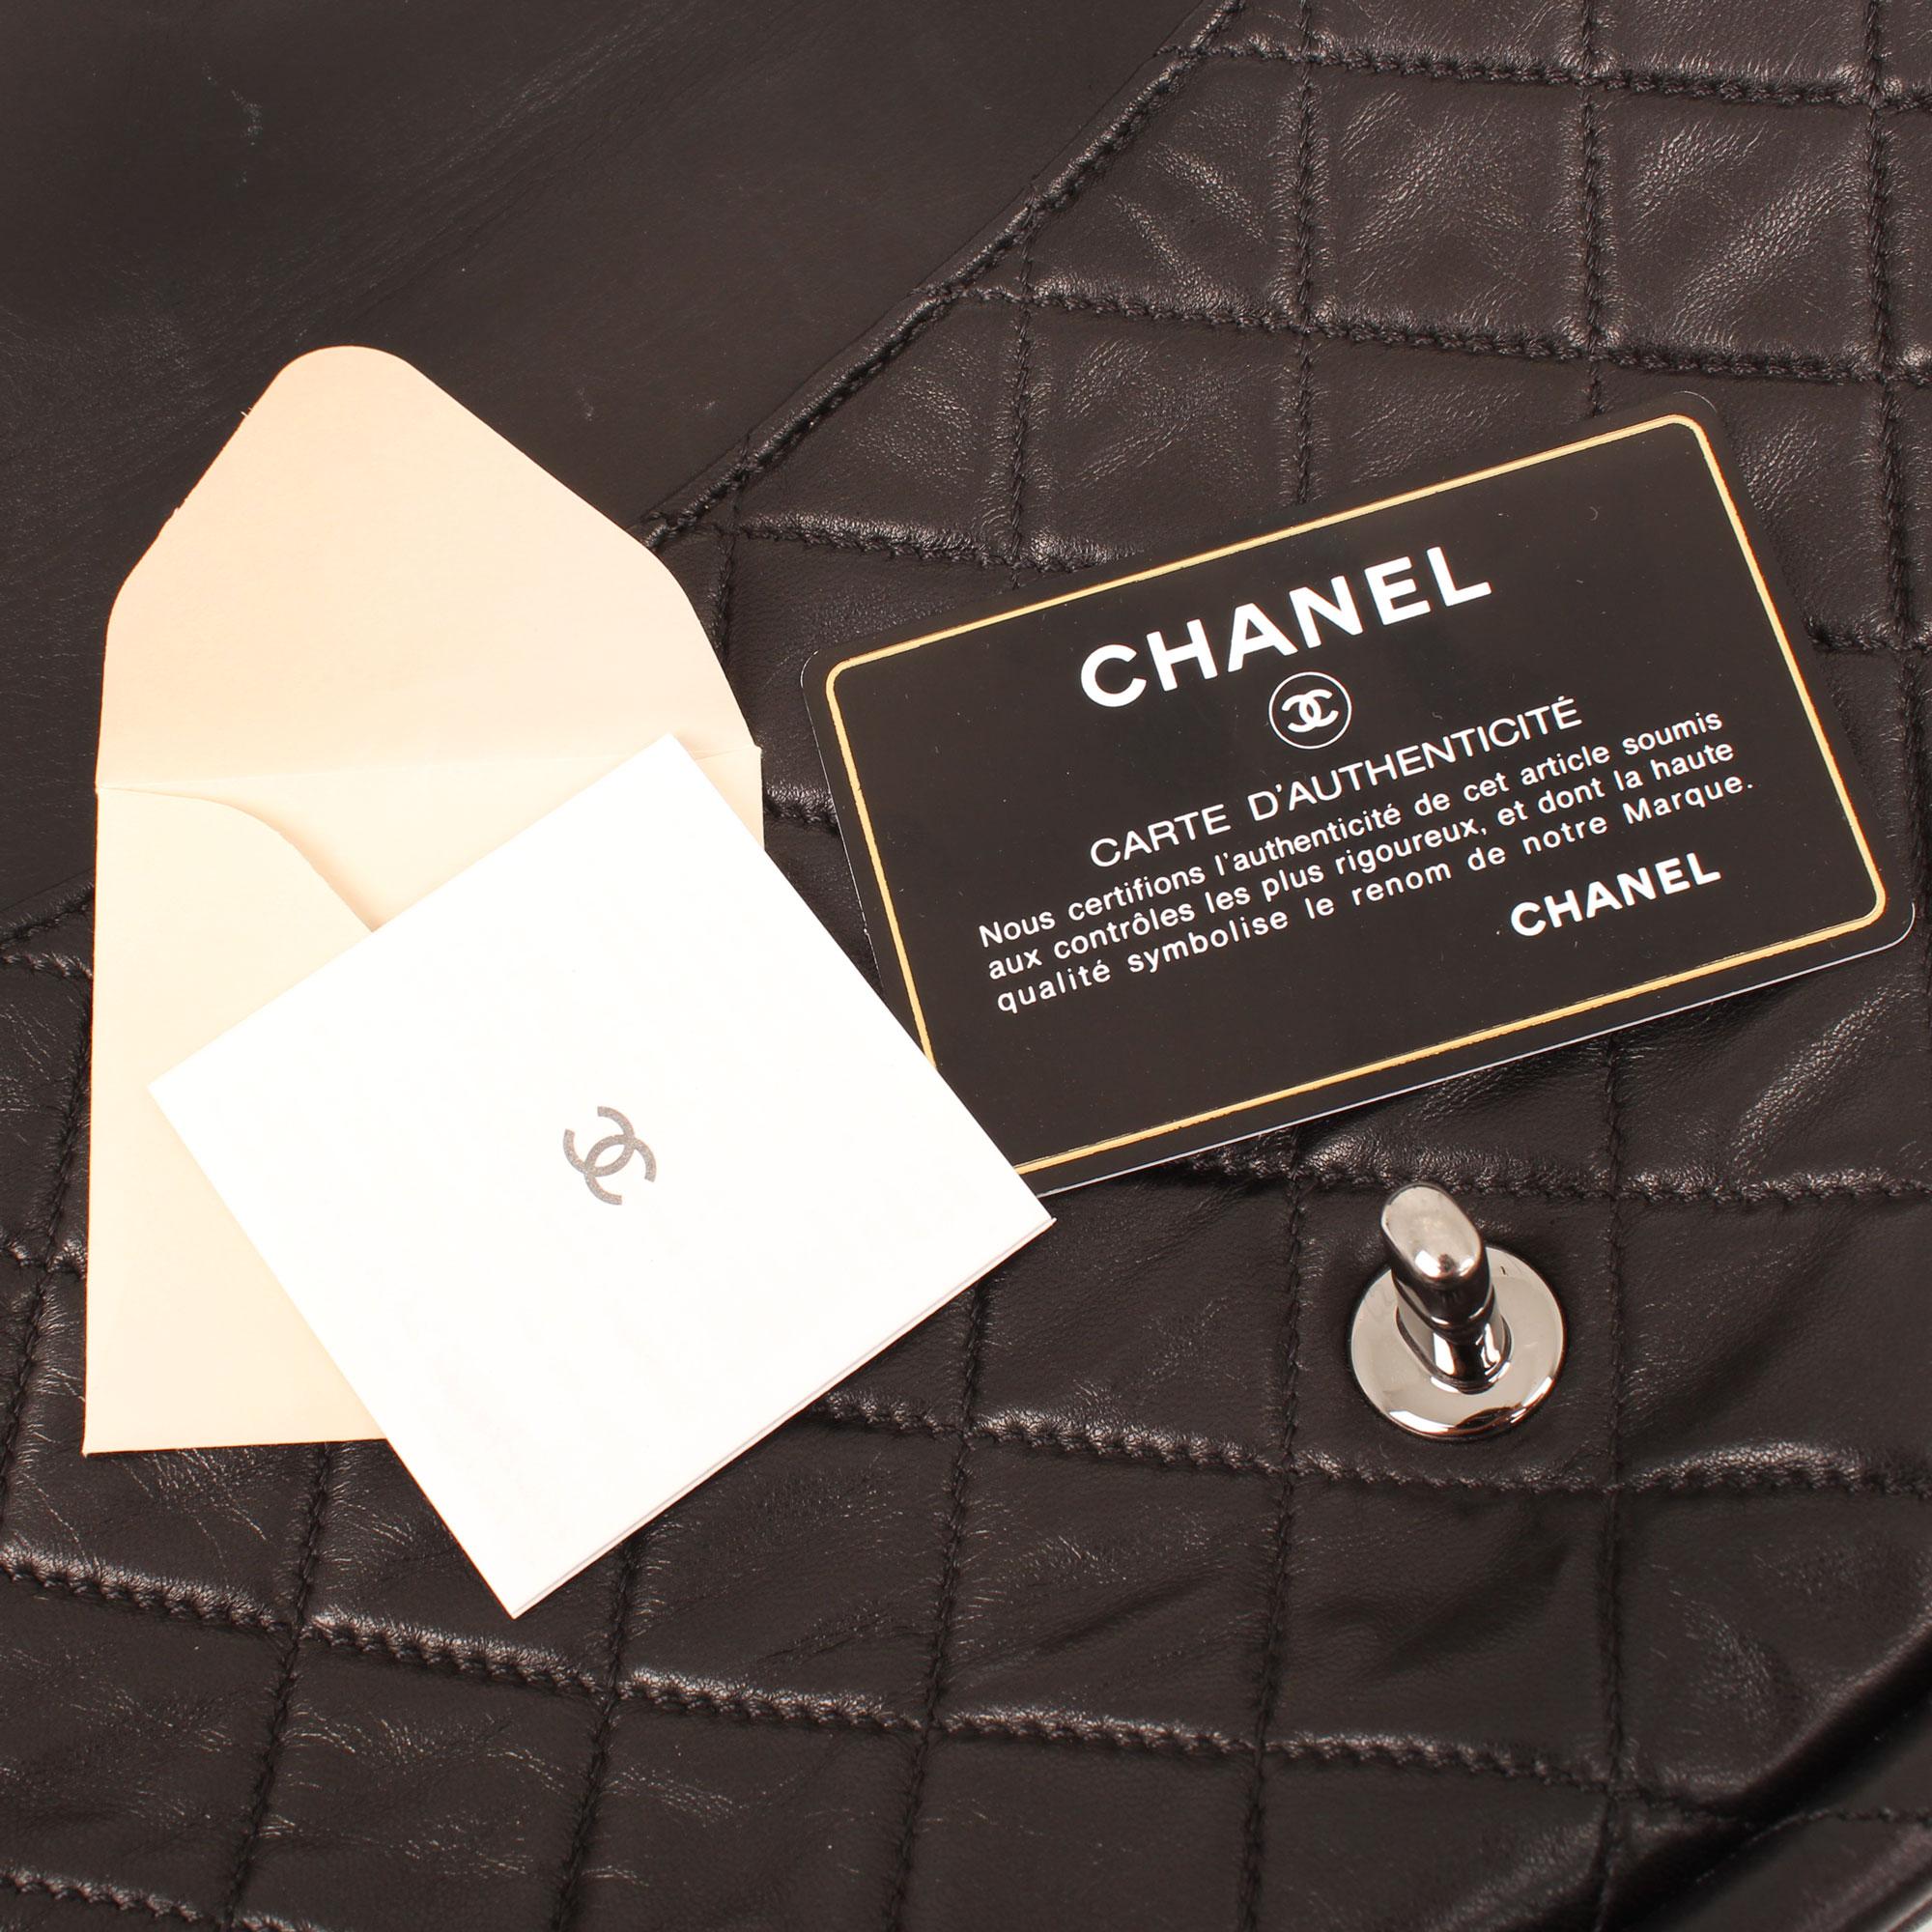 bag-chanel-hula-hoop-black-card-accessories